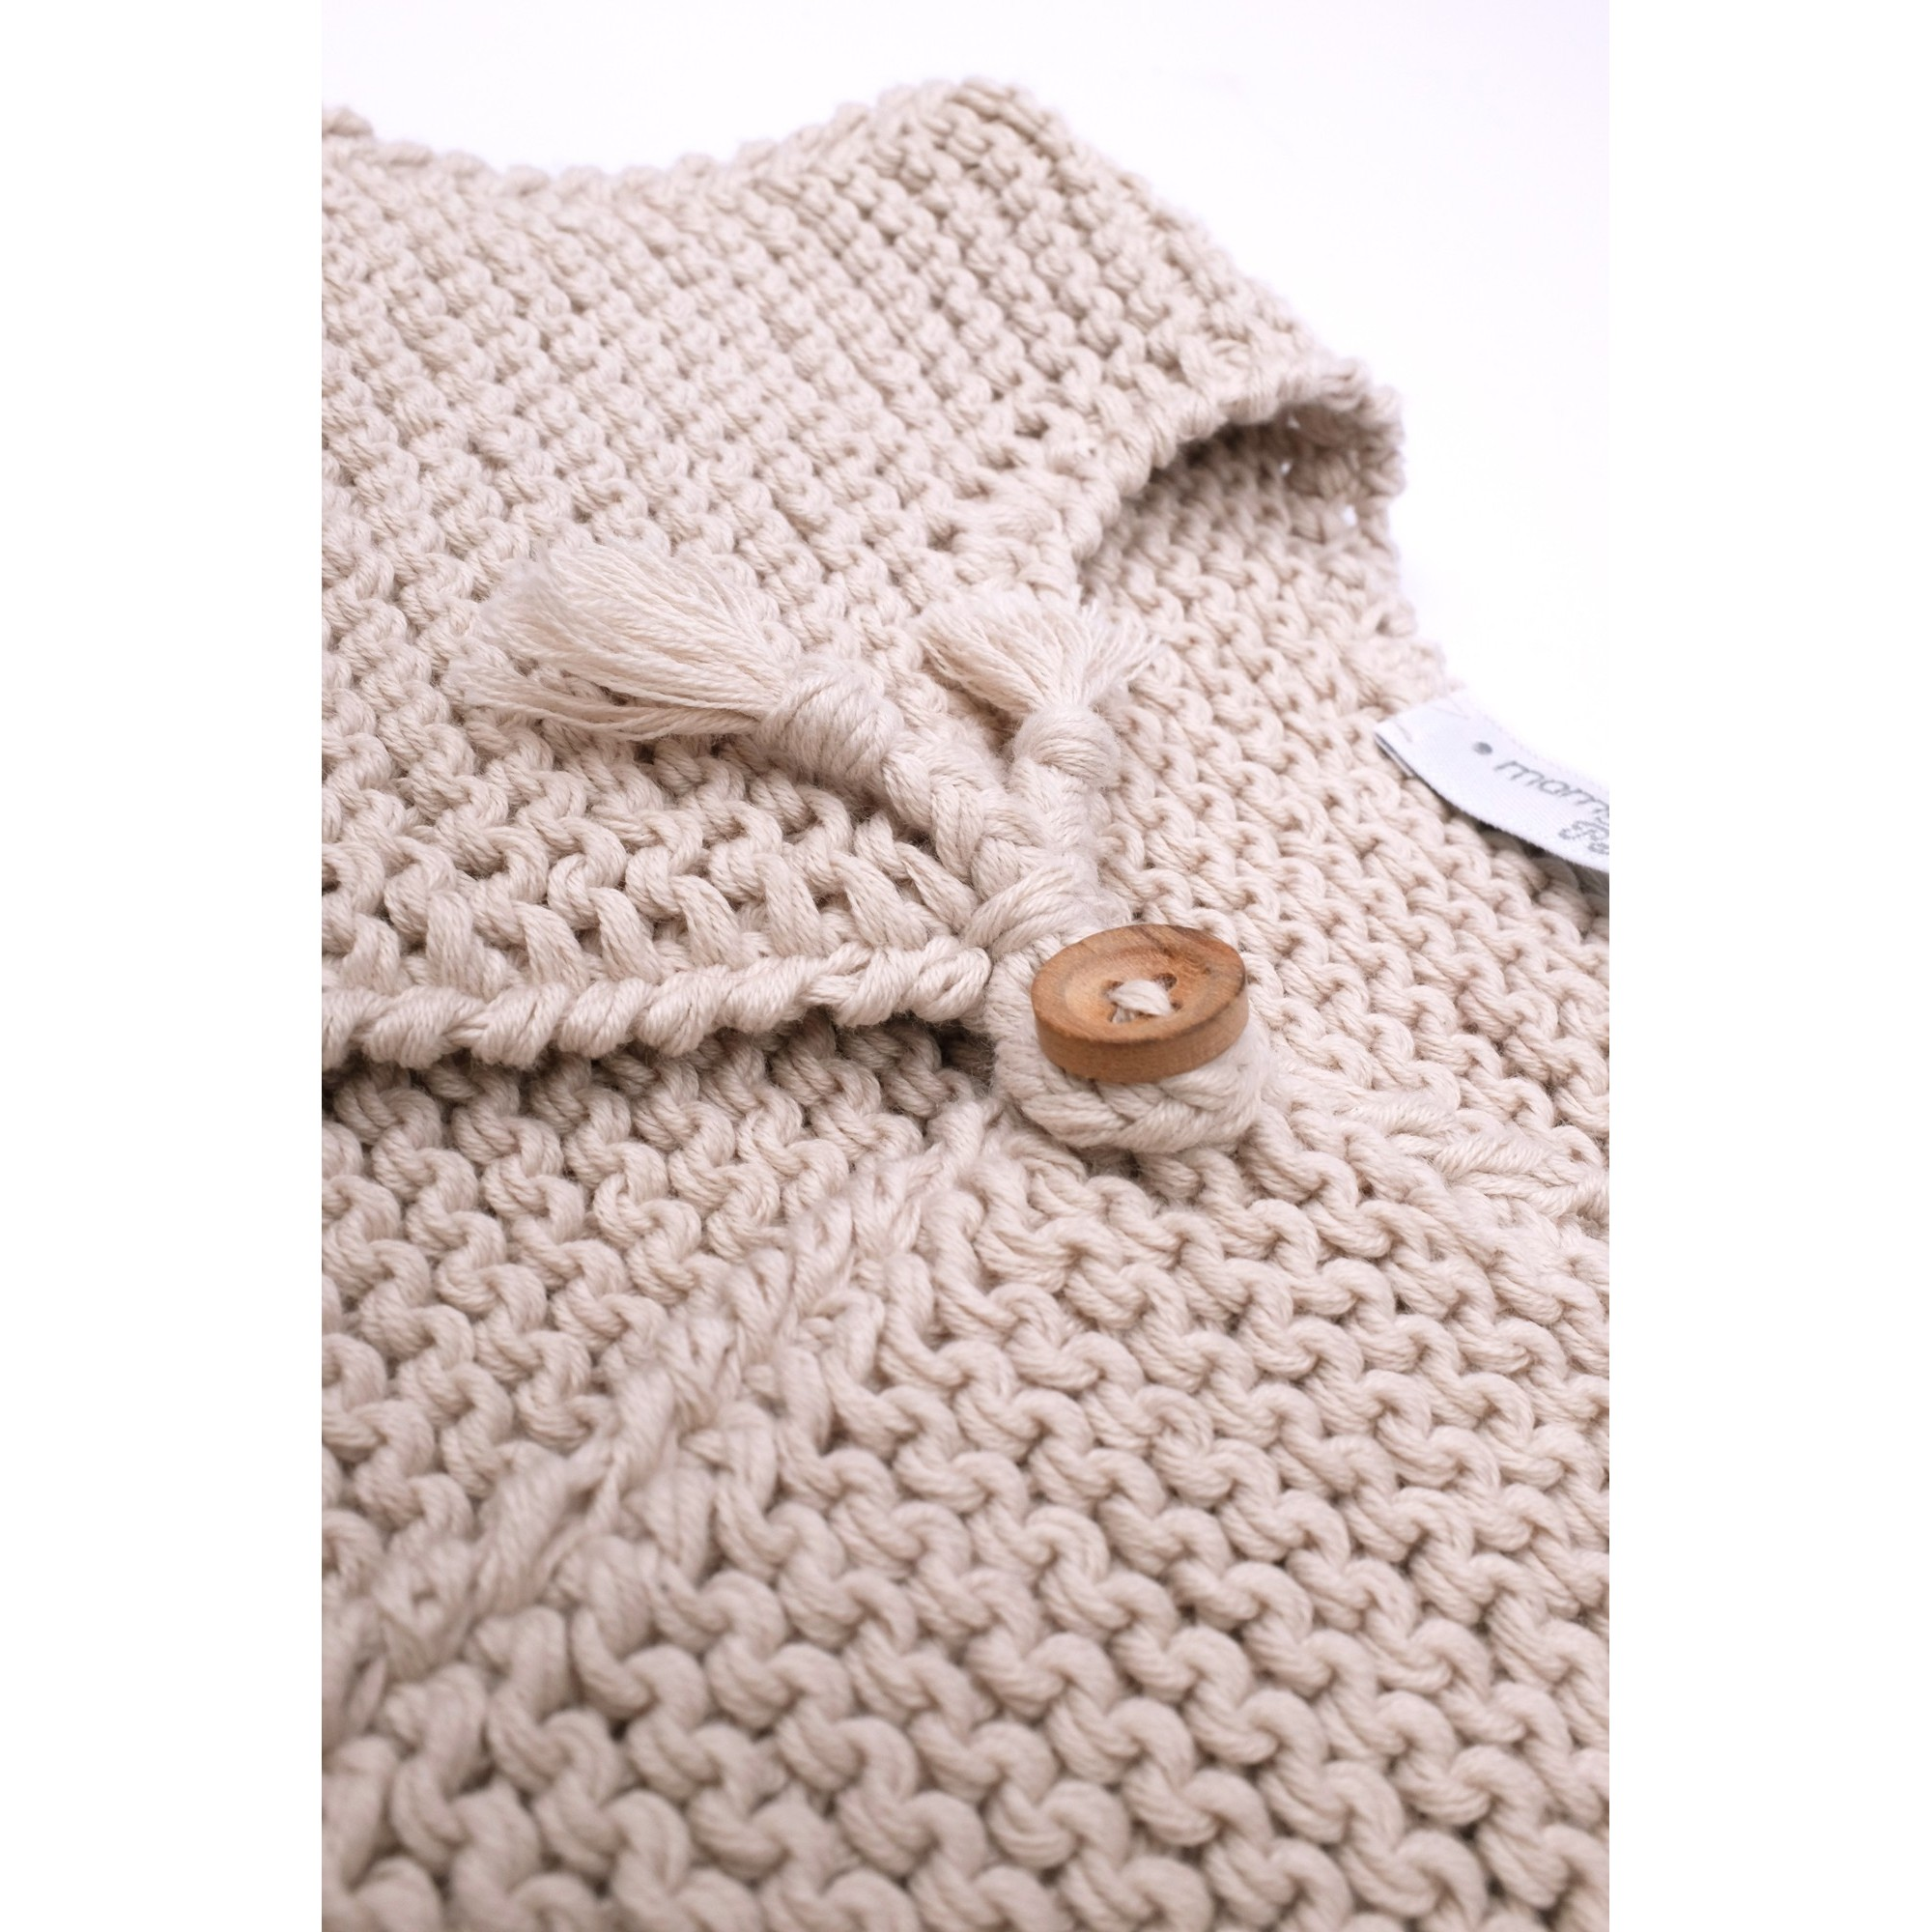 Grannys Knitwear Sand Kid Sleevless Cardigan Handknitted In